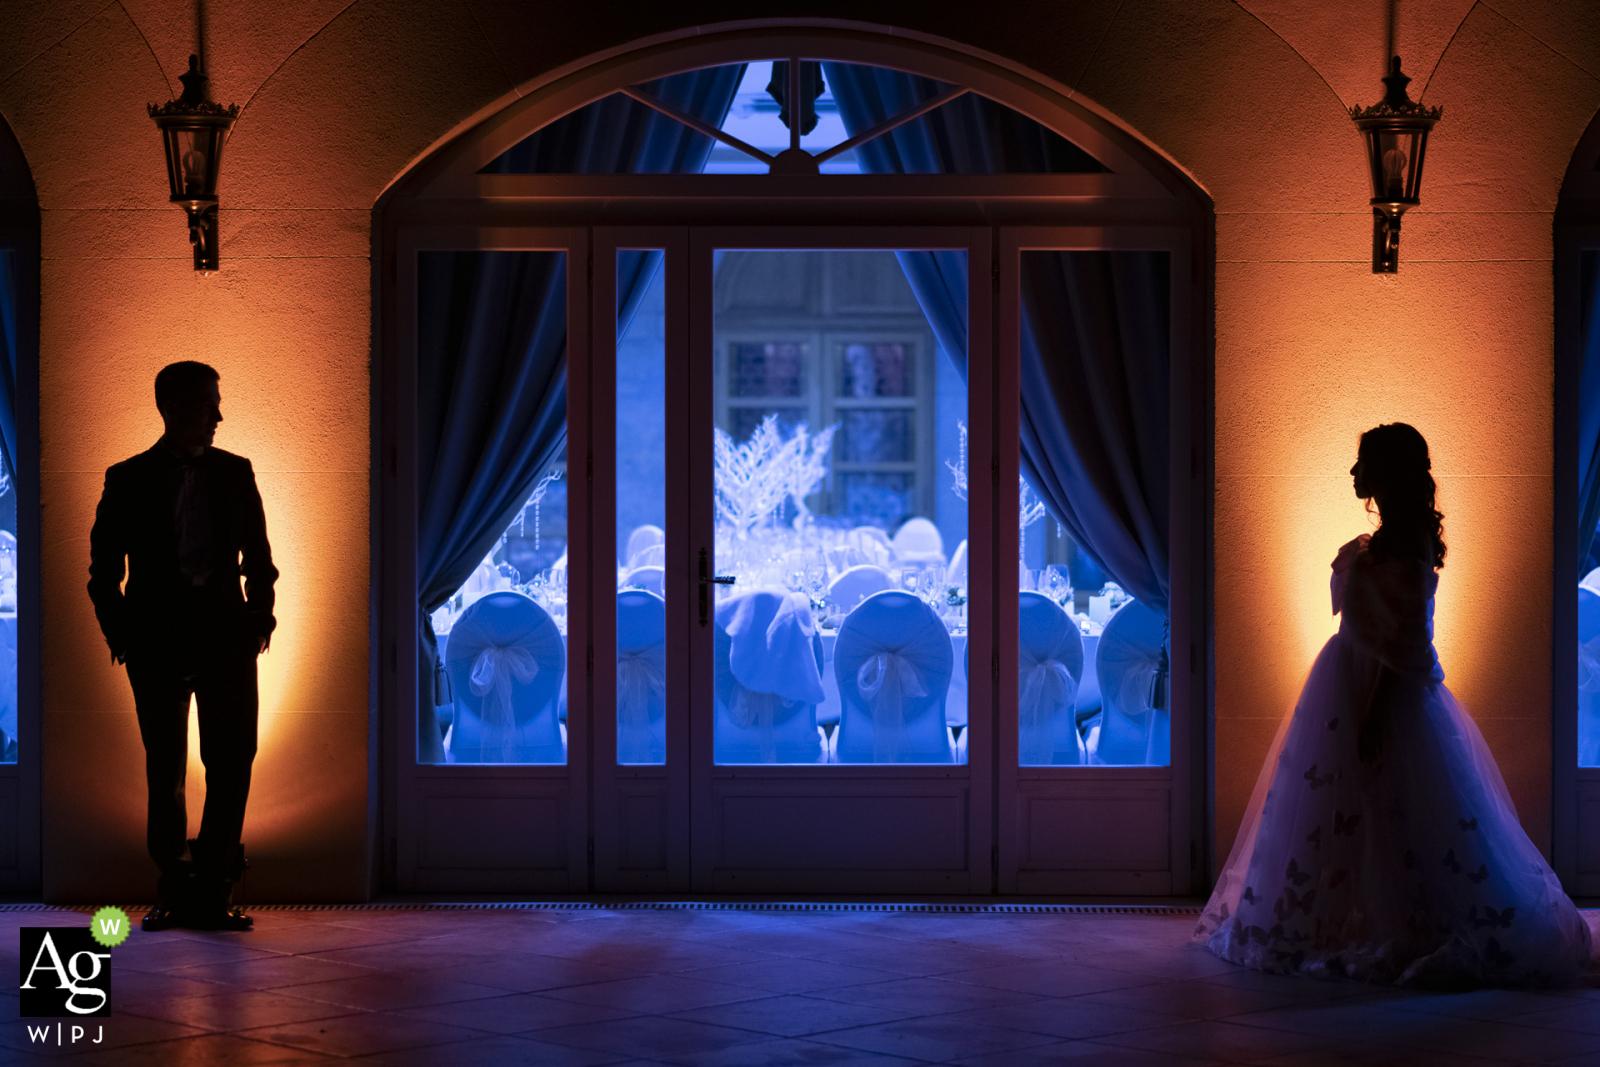 Auvergne-Rhône-Alpes wedding reception venue photo - couple behind the reception hall before the reception party